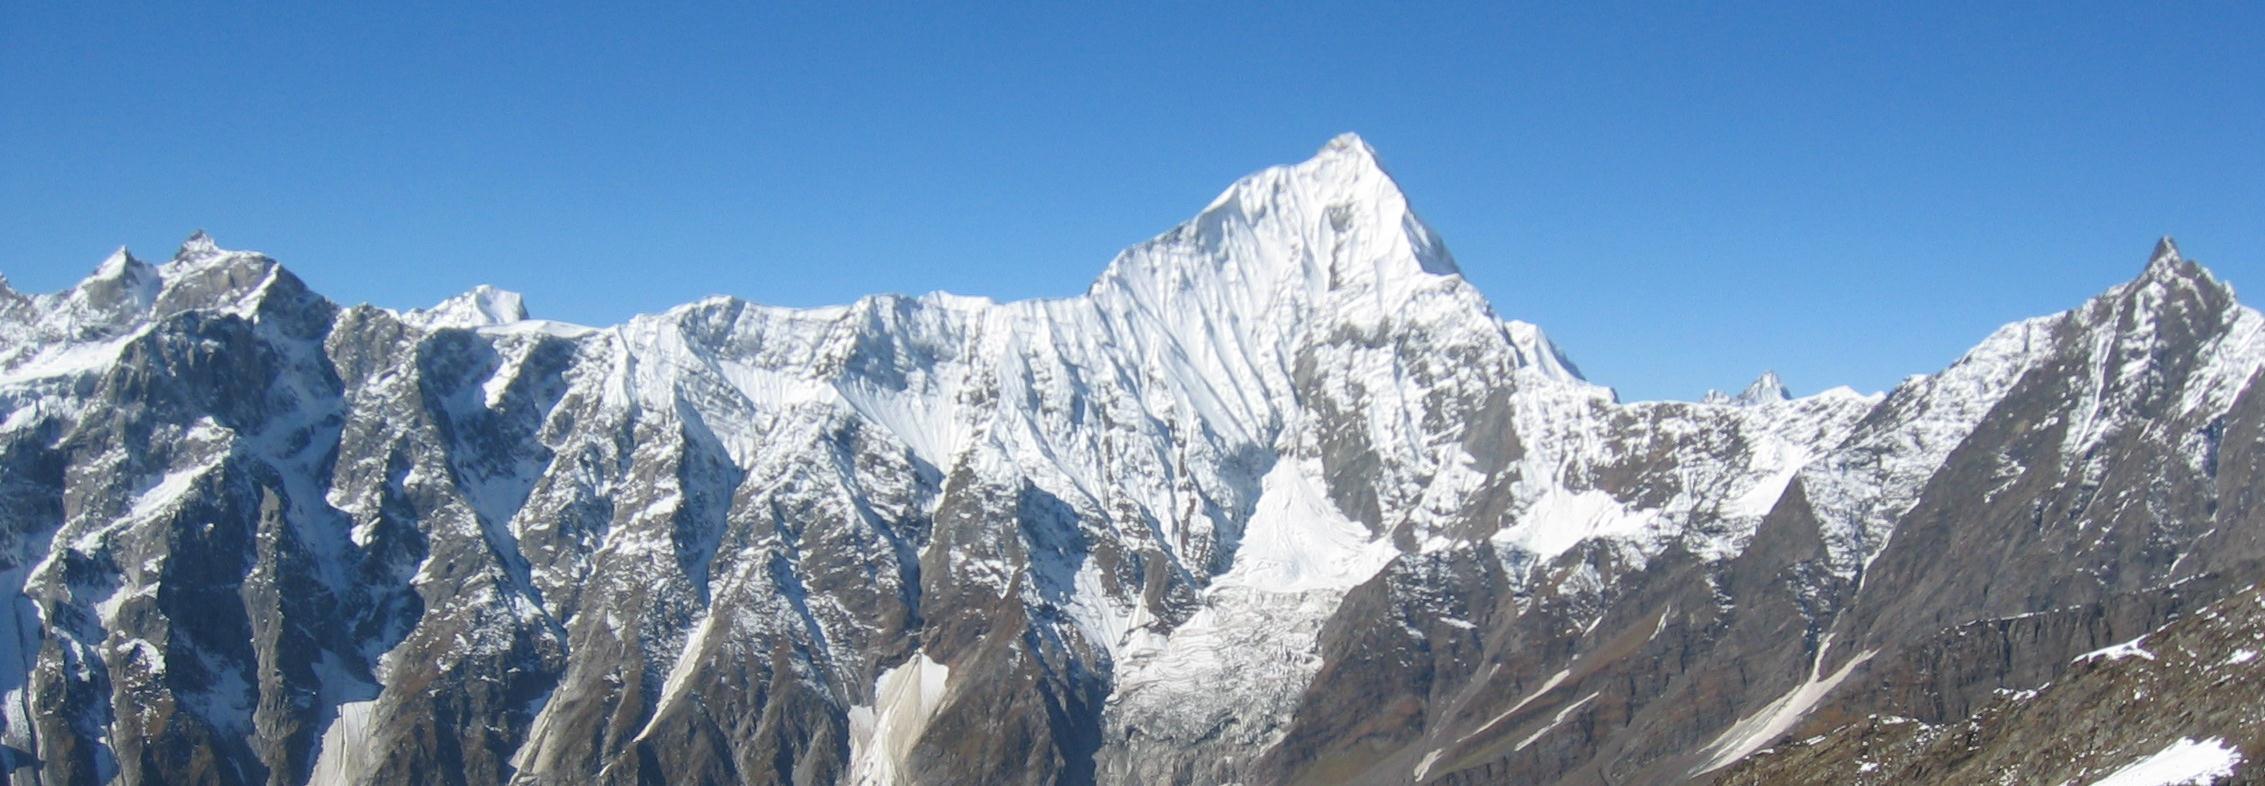 Mount Hanuman Tibba Climbing